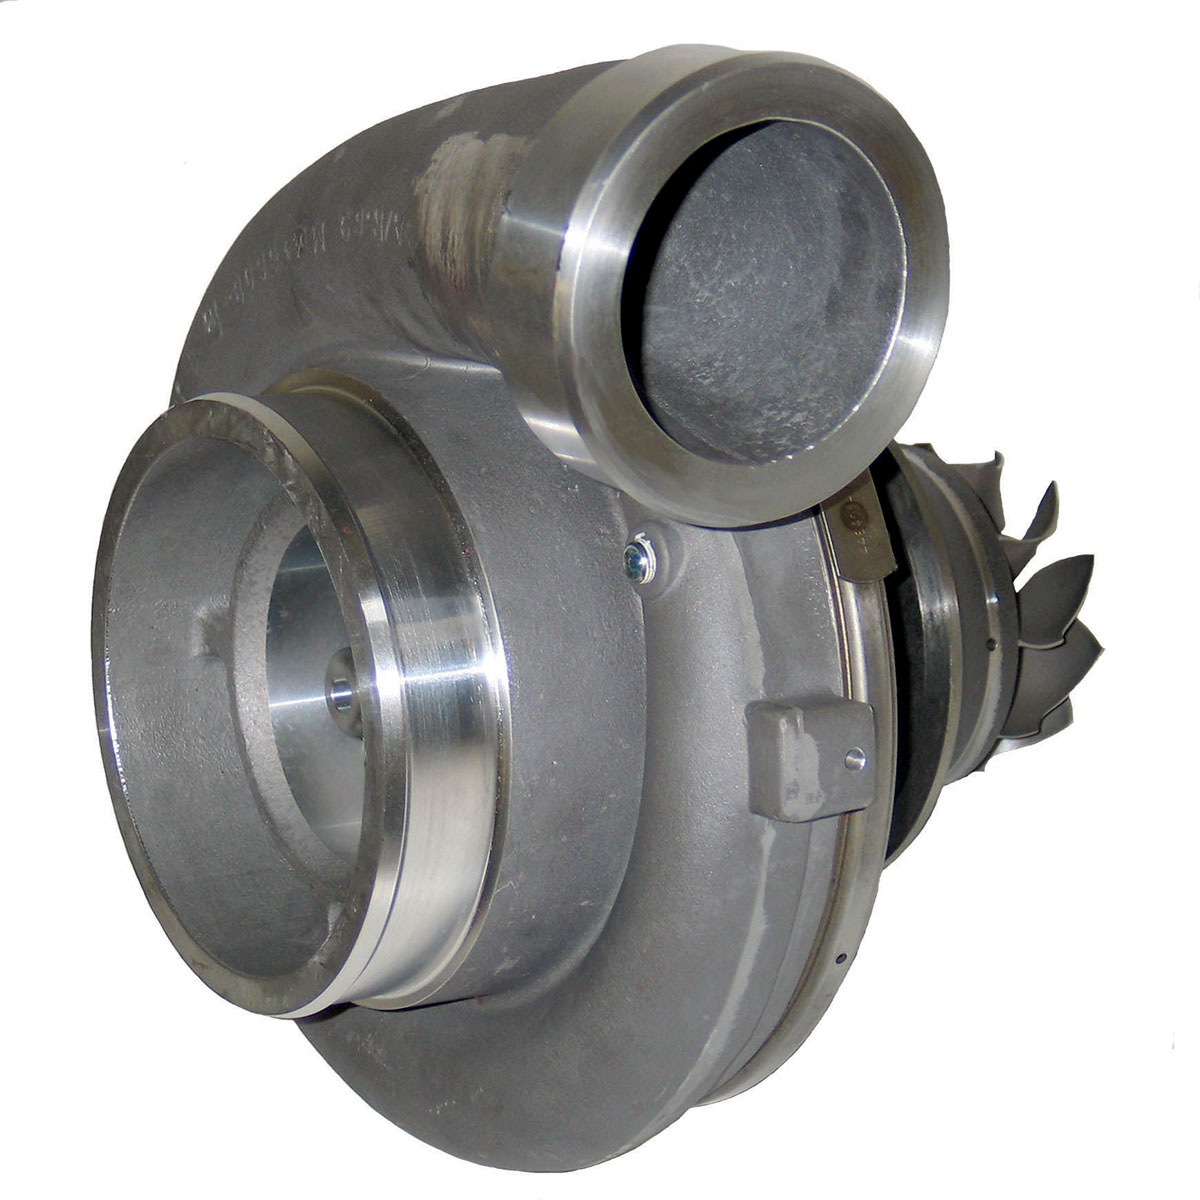 Garrett Gt2871r Turbocharger: Garrett GT2871R Turbocharger [743347-2]